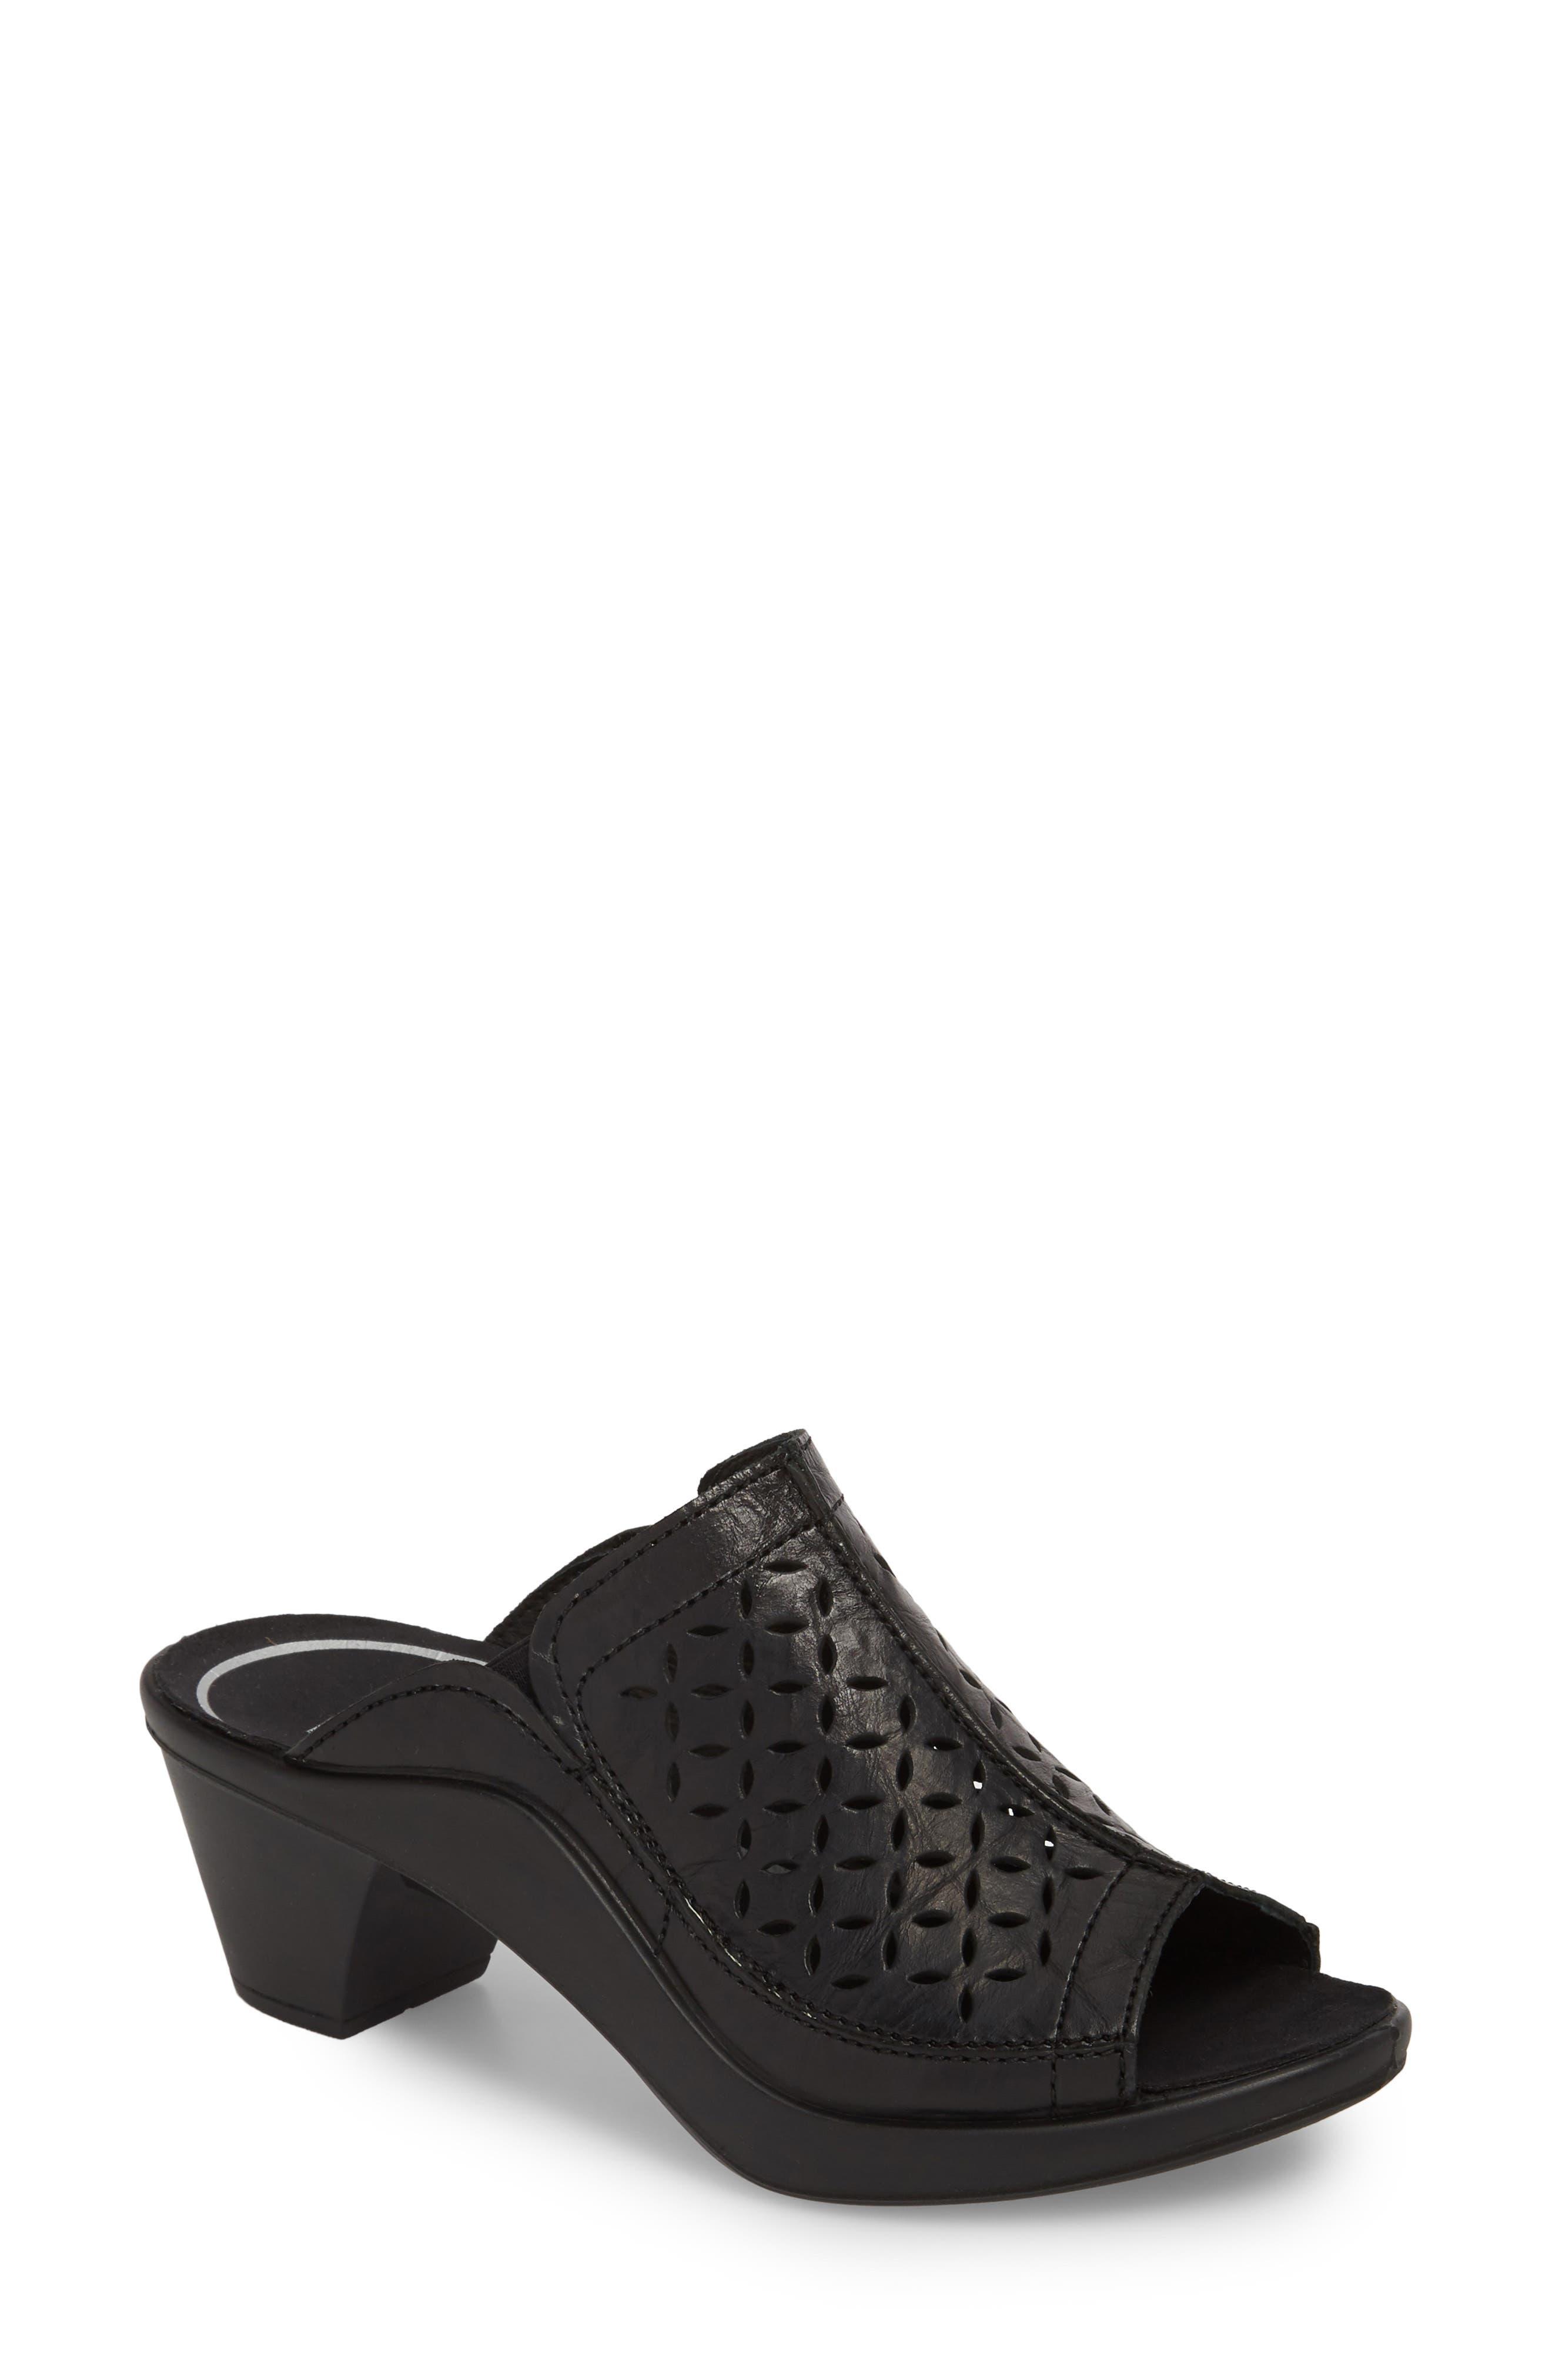 Mokassetta 326 Mule,                             Main thumbnail 1, color,                             Black Leather